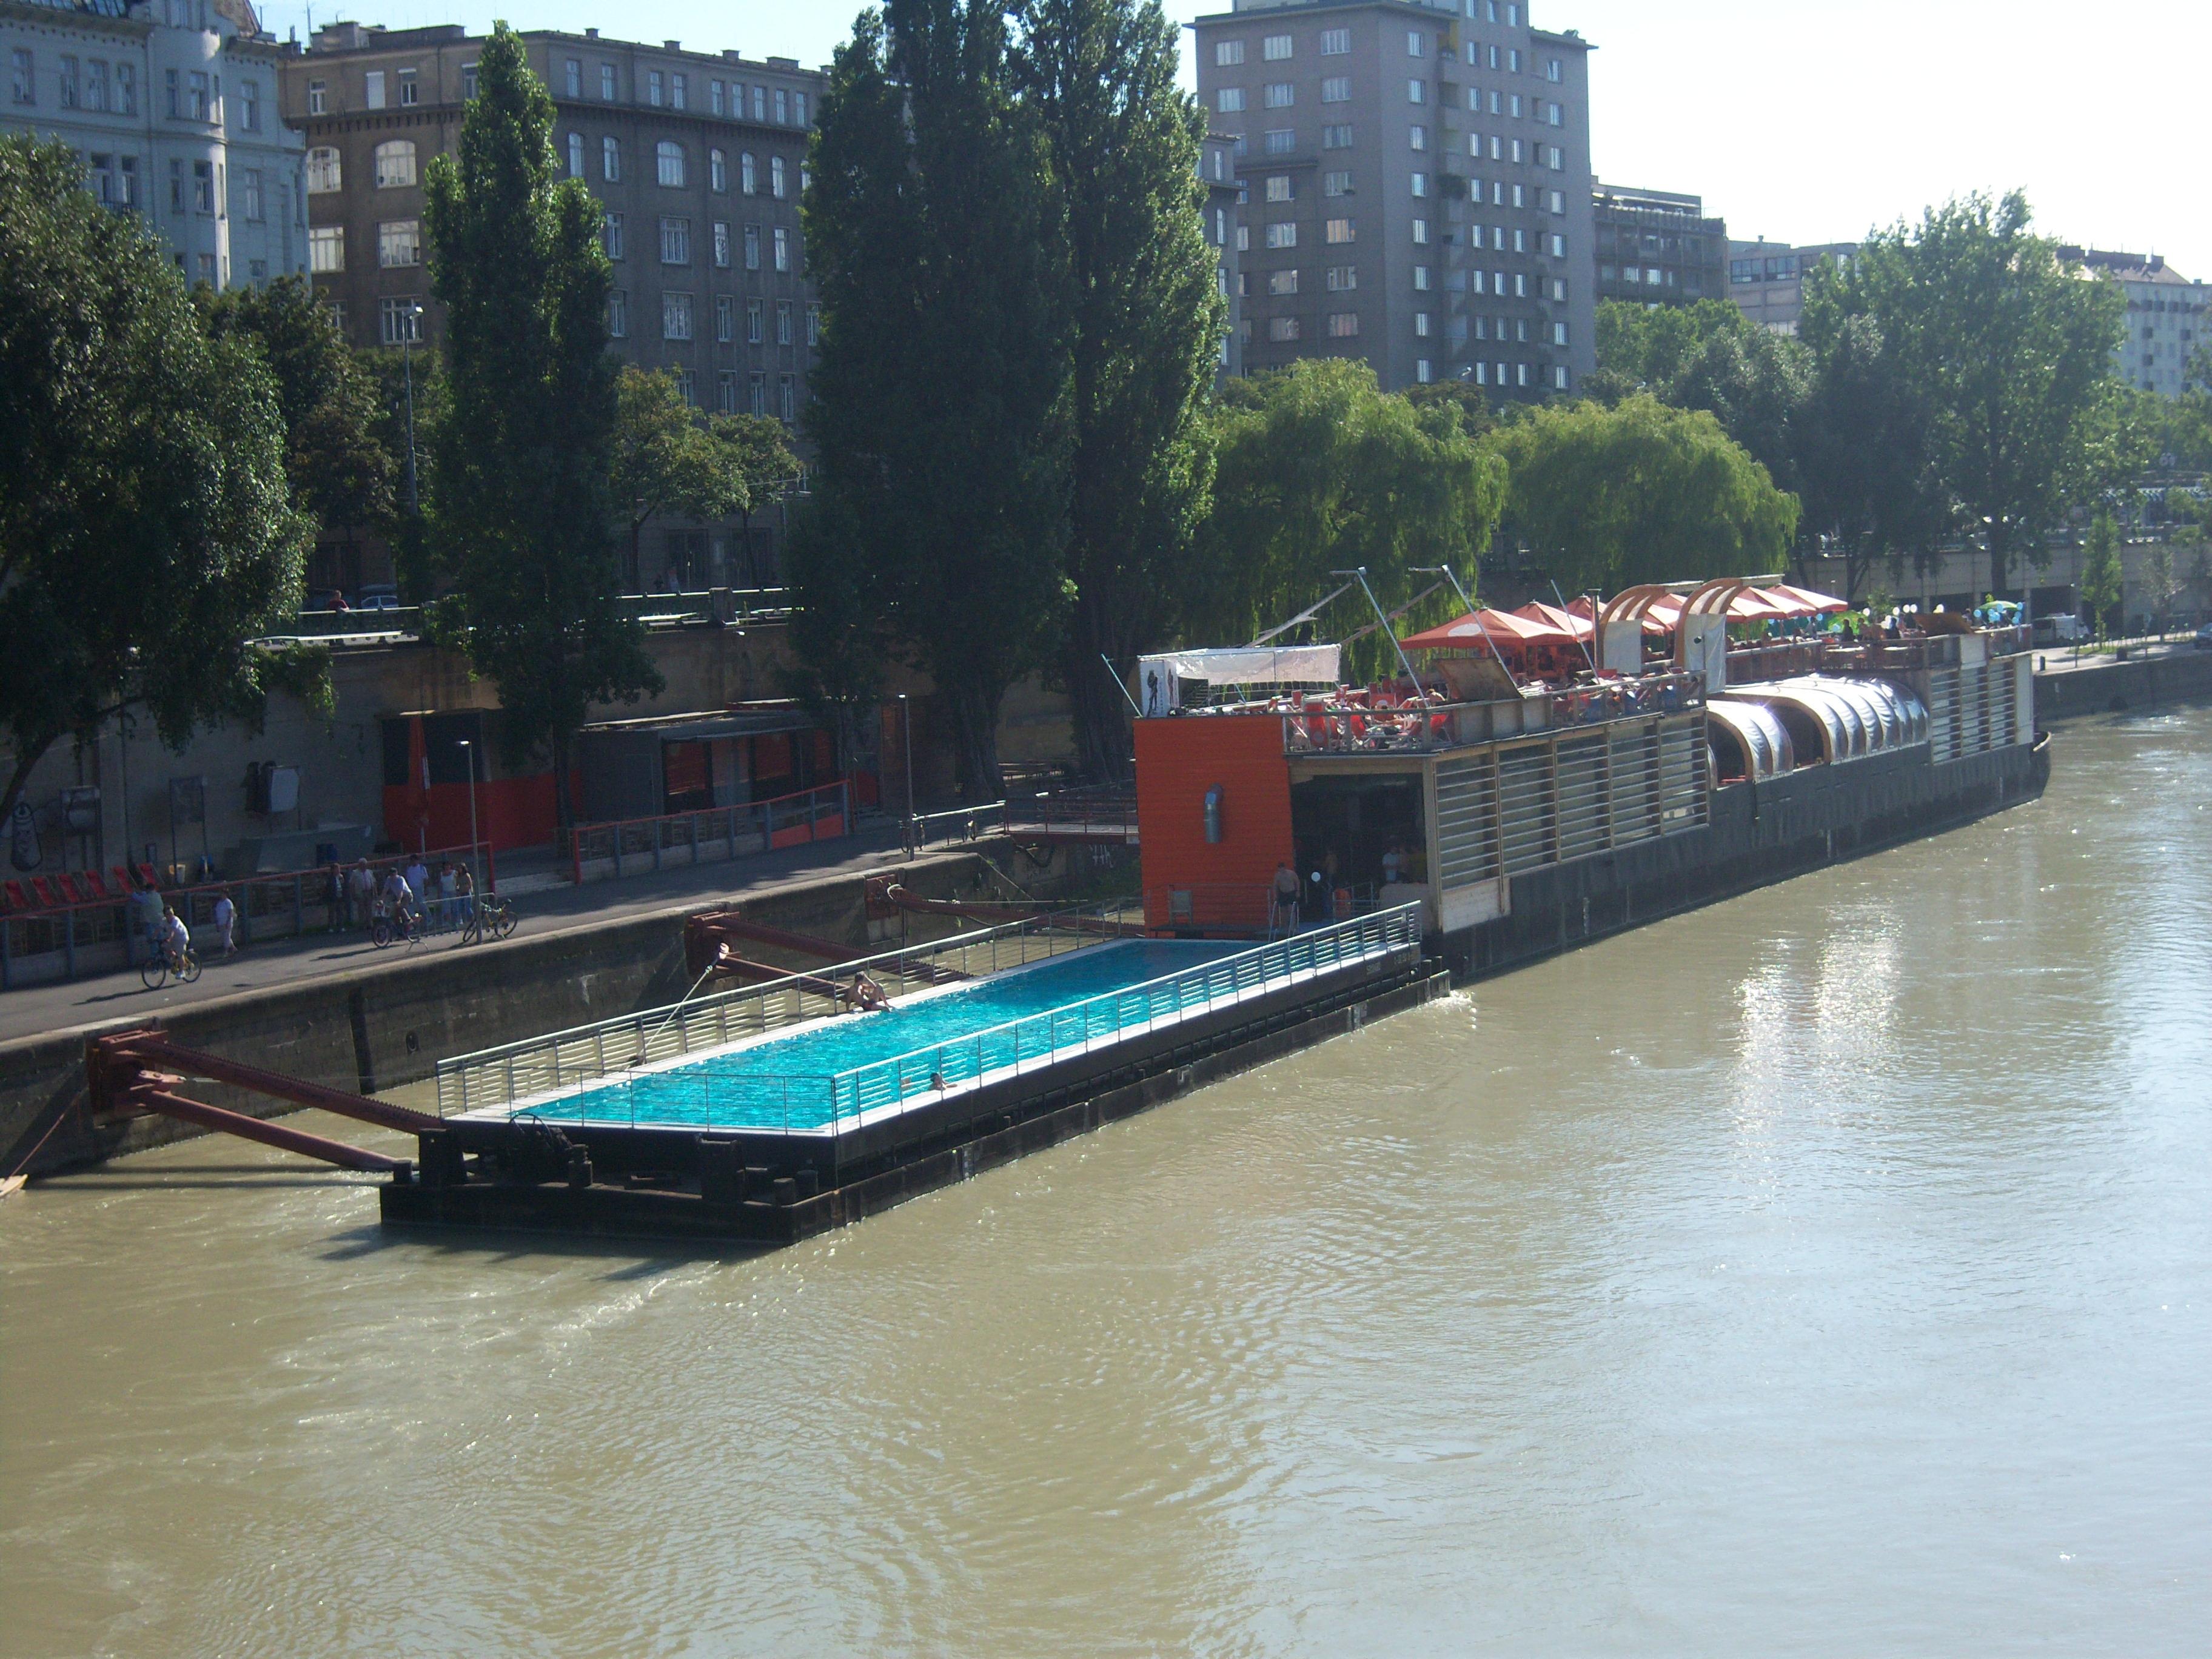 Badeschiff Wien2.JPG